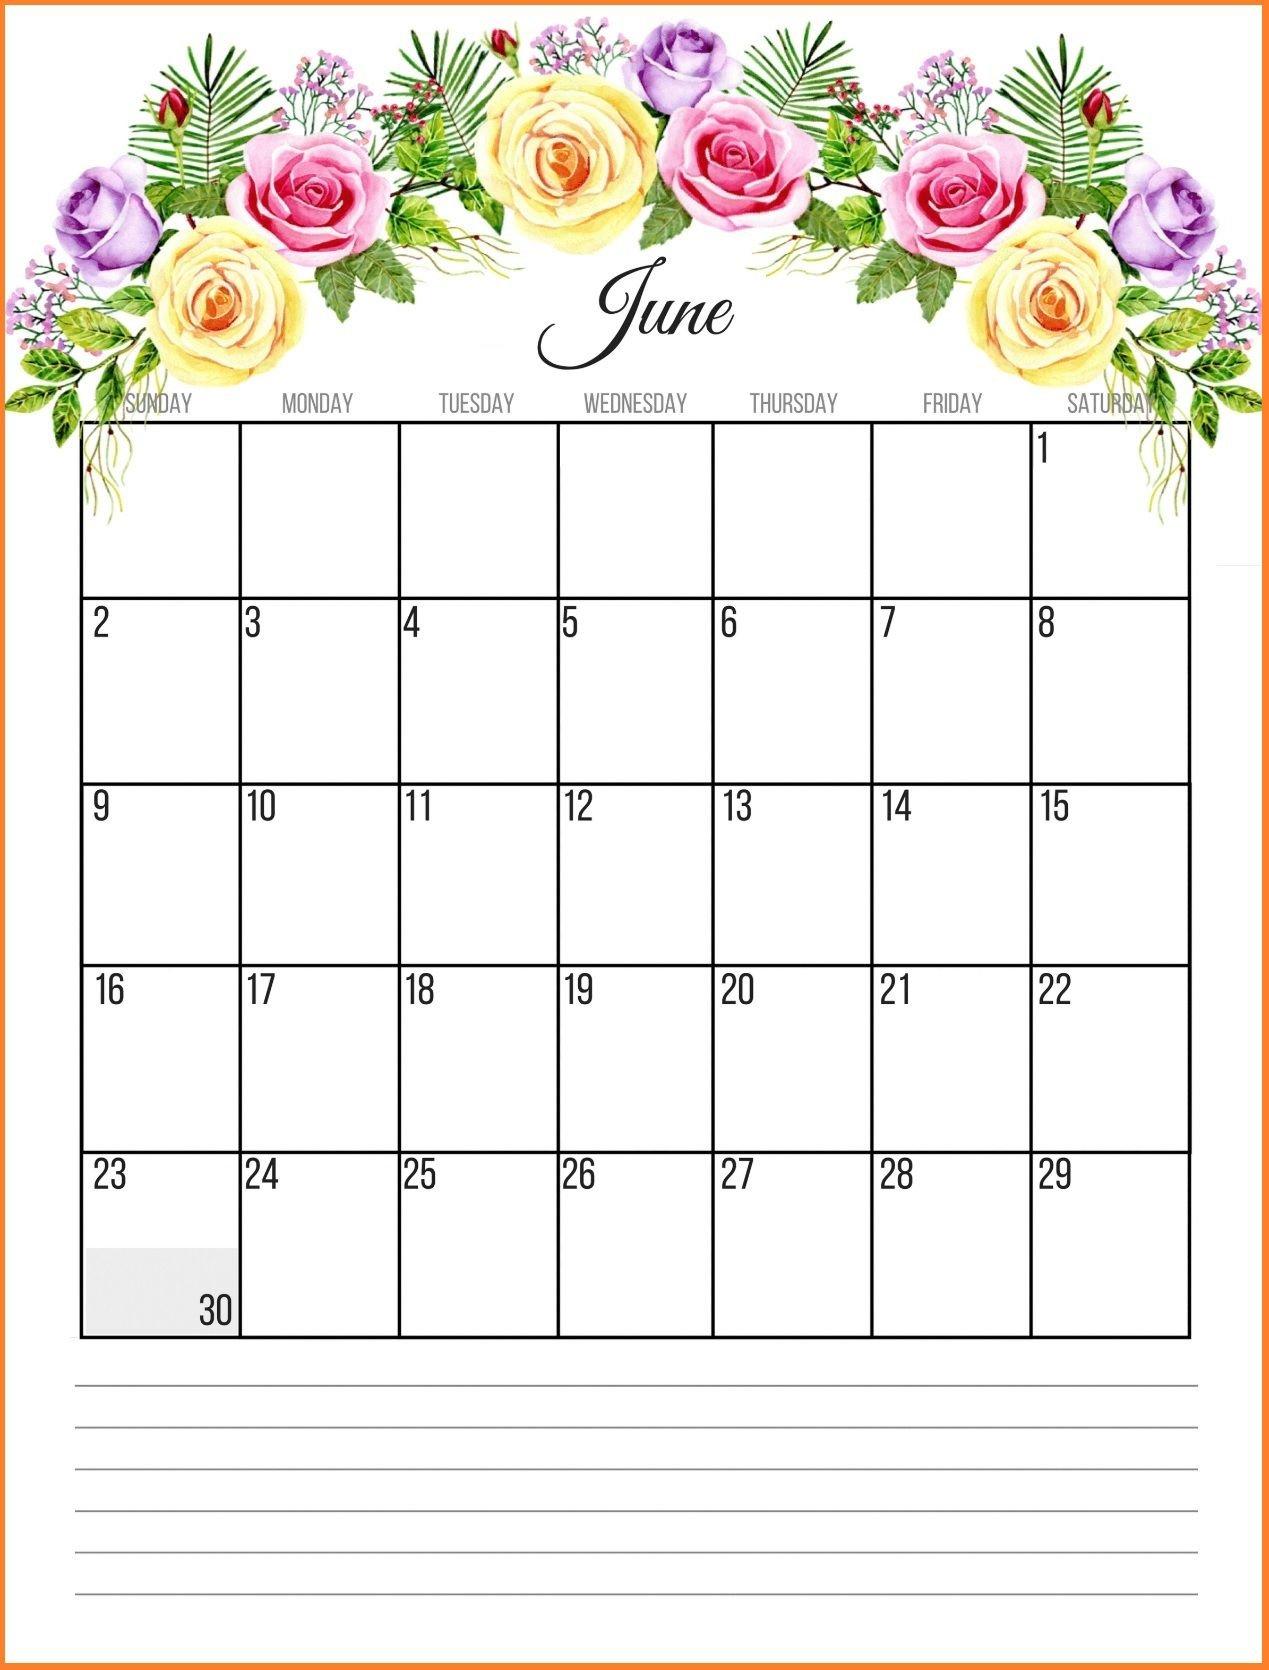 June 2019 Floral Calendar | Paper Crafts | Calendar June, June 2019 June 9 2019 Calendar